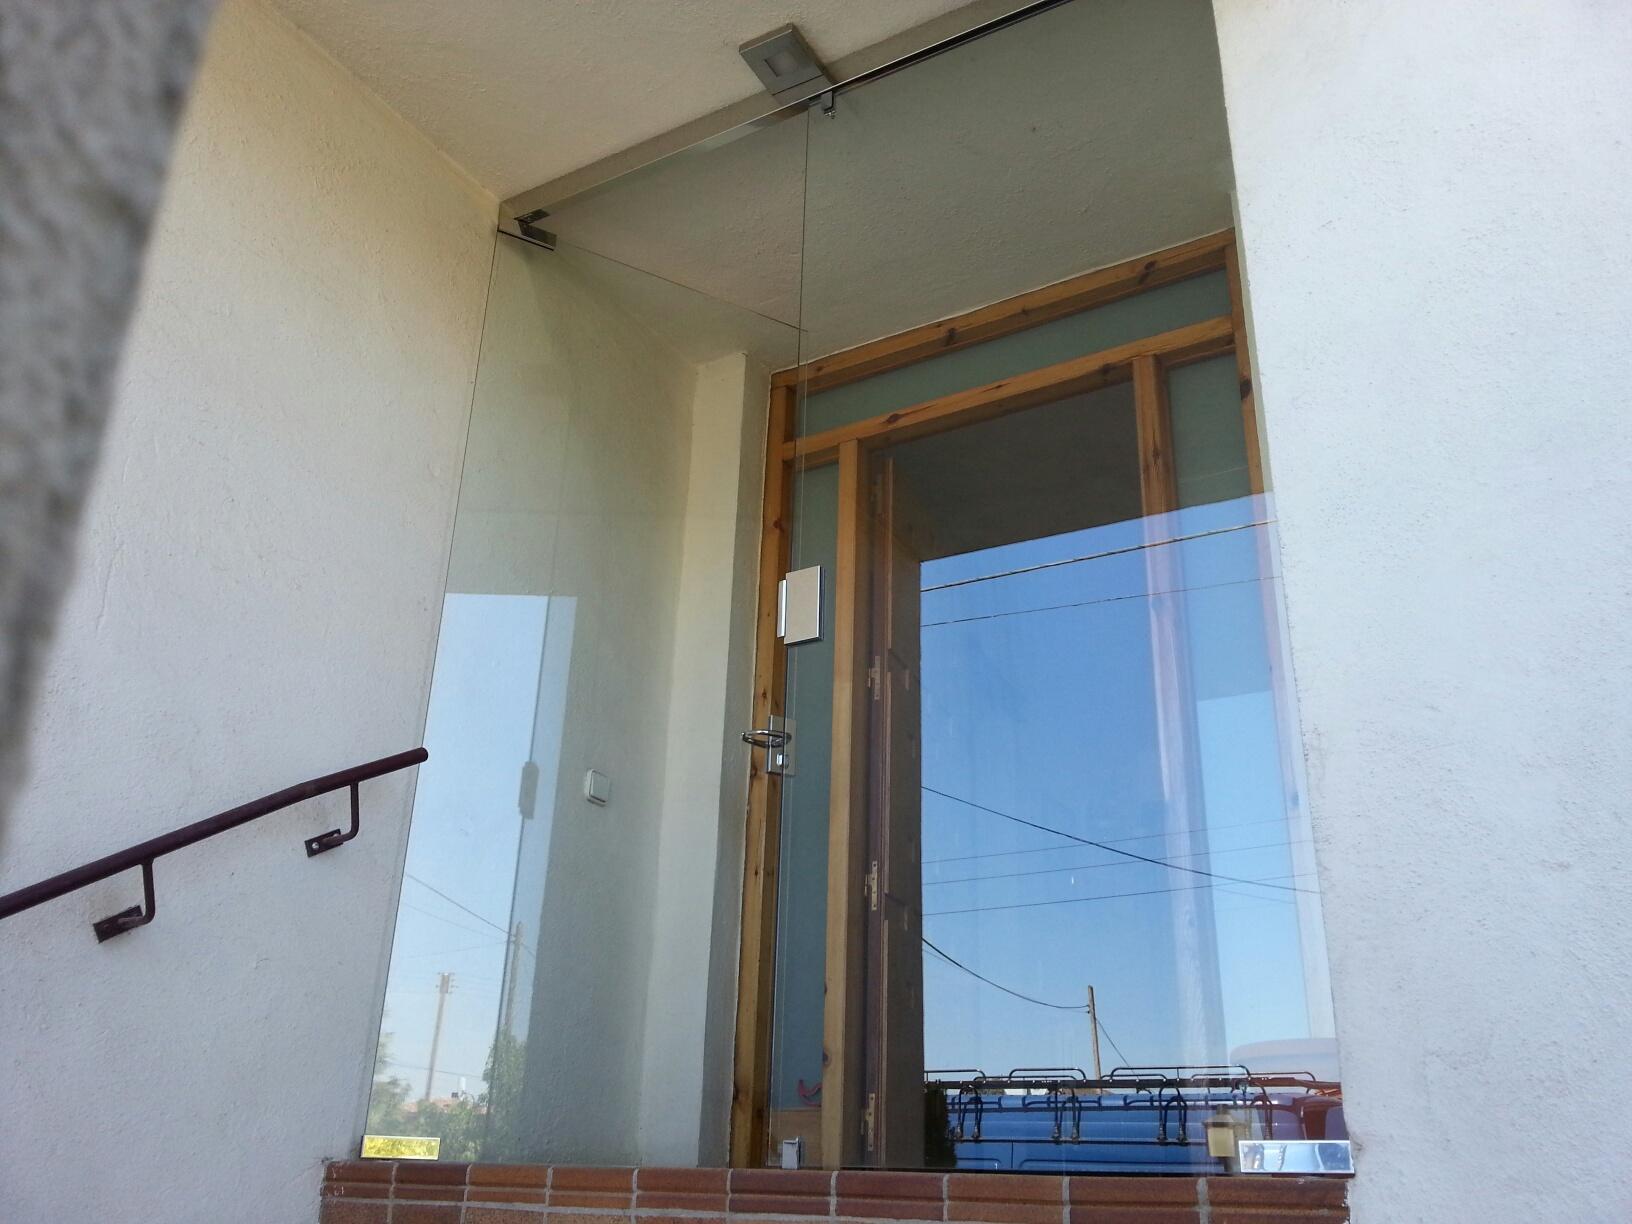 Galer a fotogr fica de carpinter a de aluminio ponsico for Puertas de entrada con vidrio